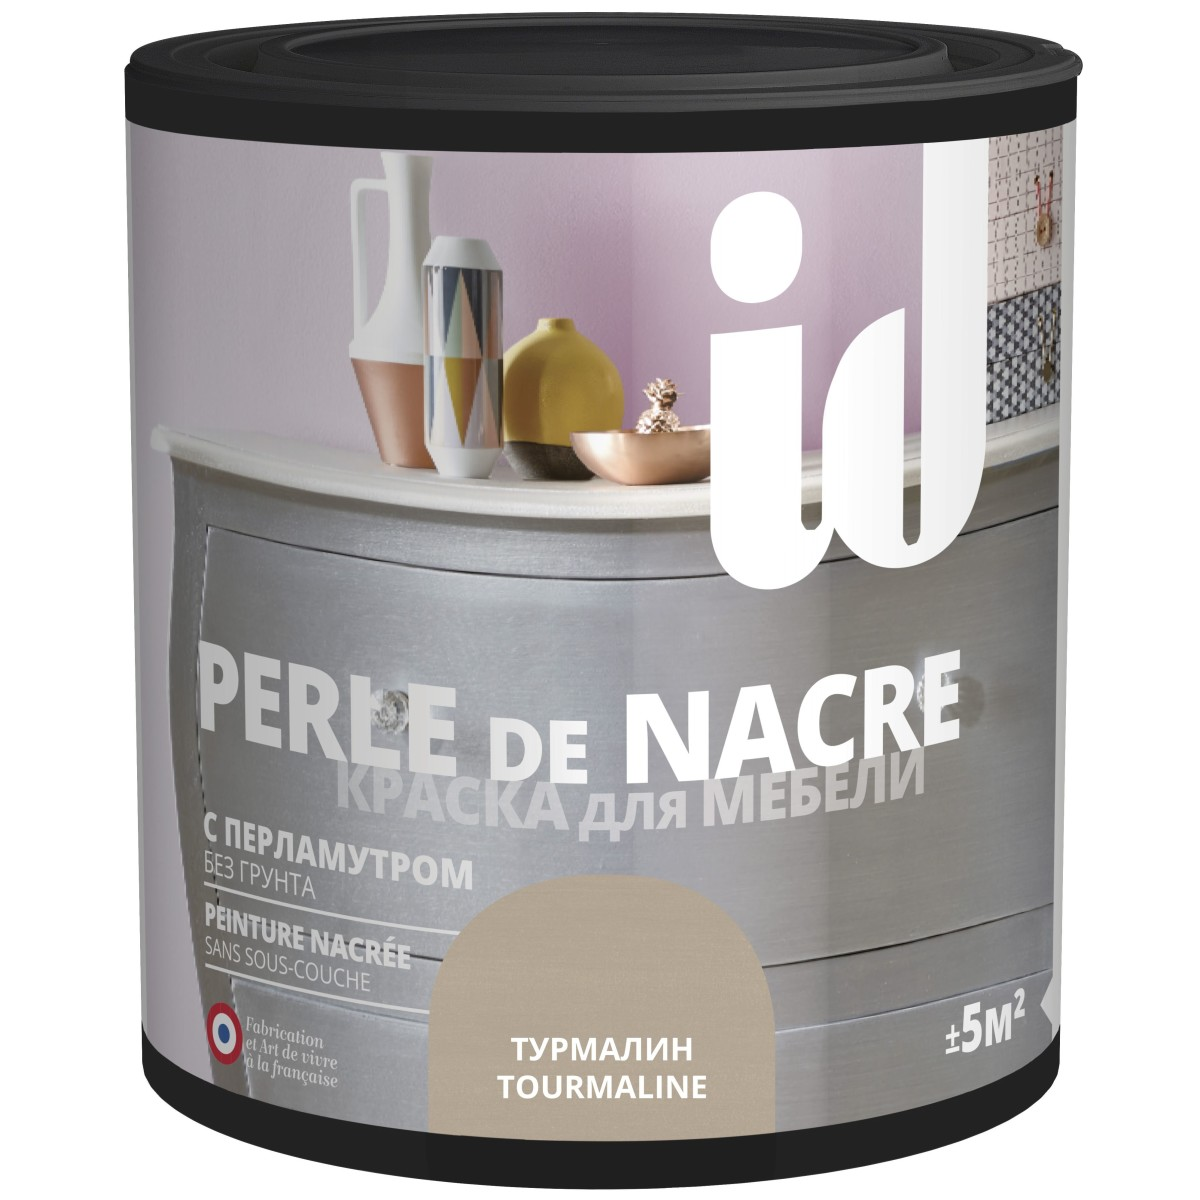 Краска для мебели ID Perle цвет турмалин 0.5 л